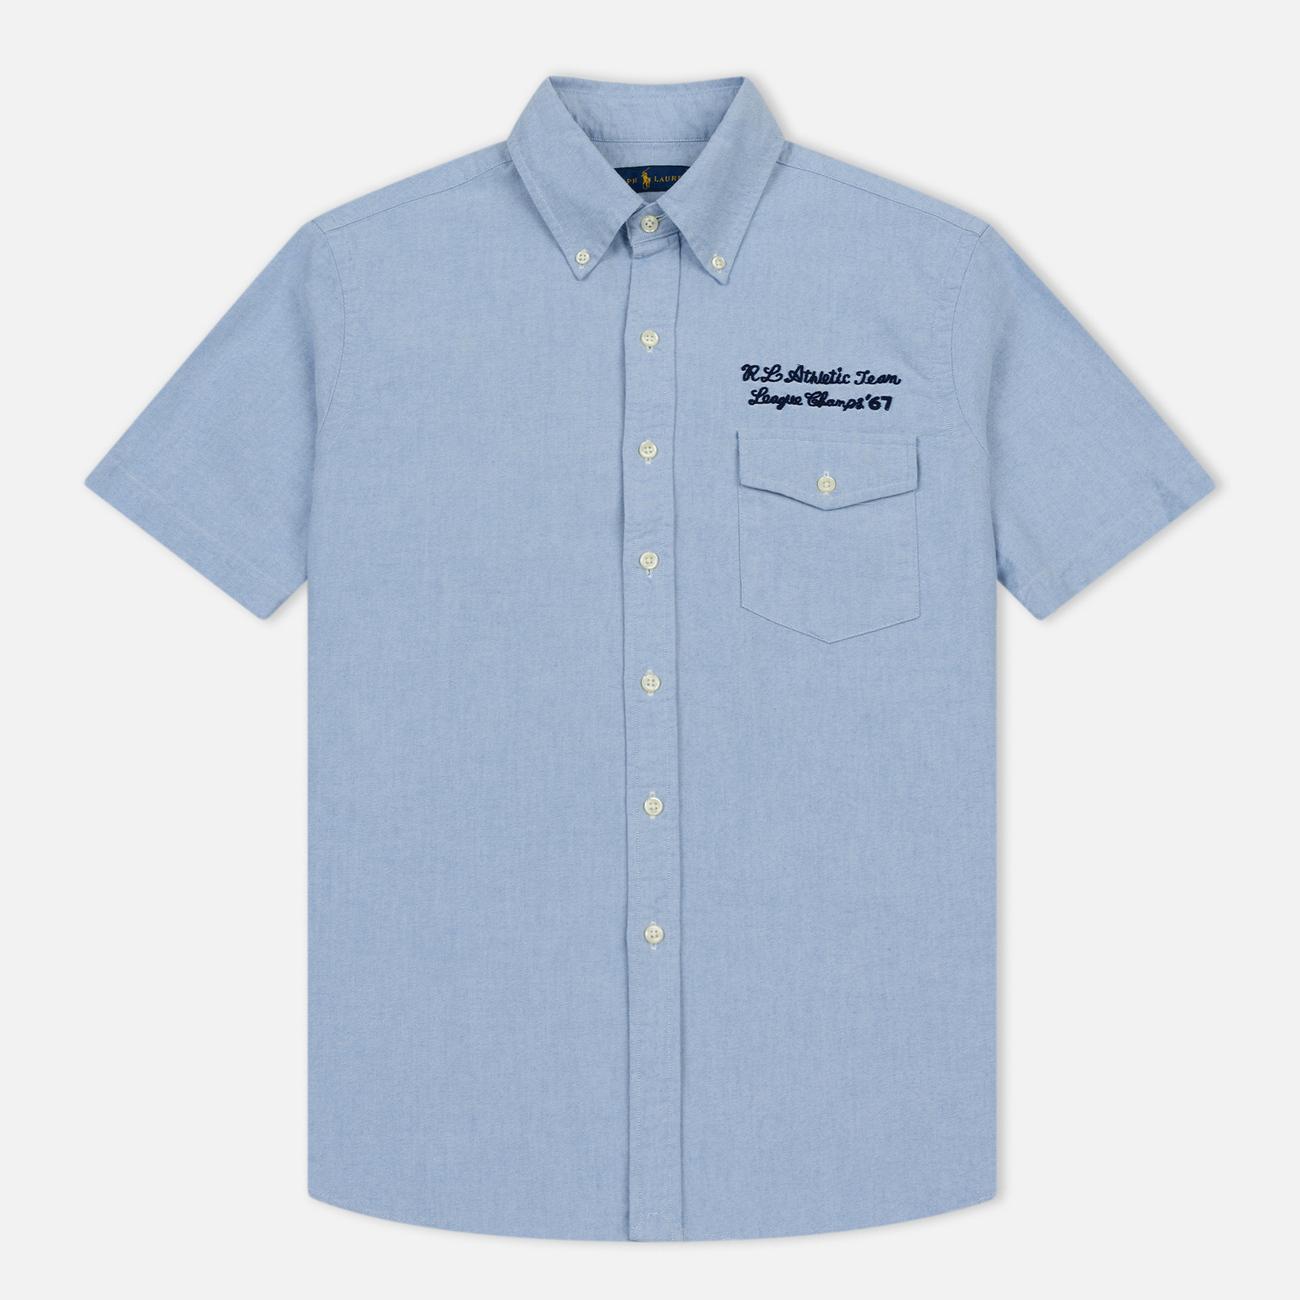 Мужская рубашка Polo Ralph Lauren Oxford Sport SS Embroidered Inscription Blue Tour Art